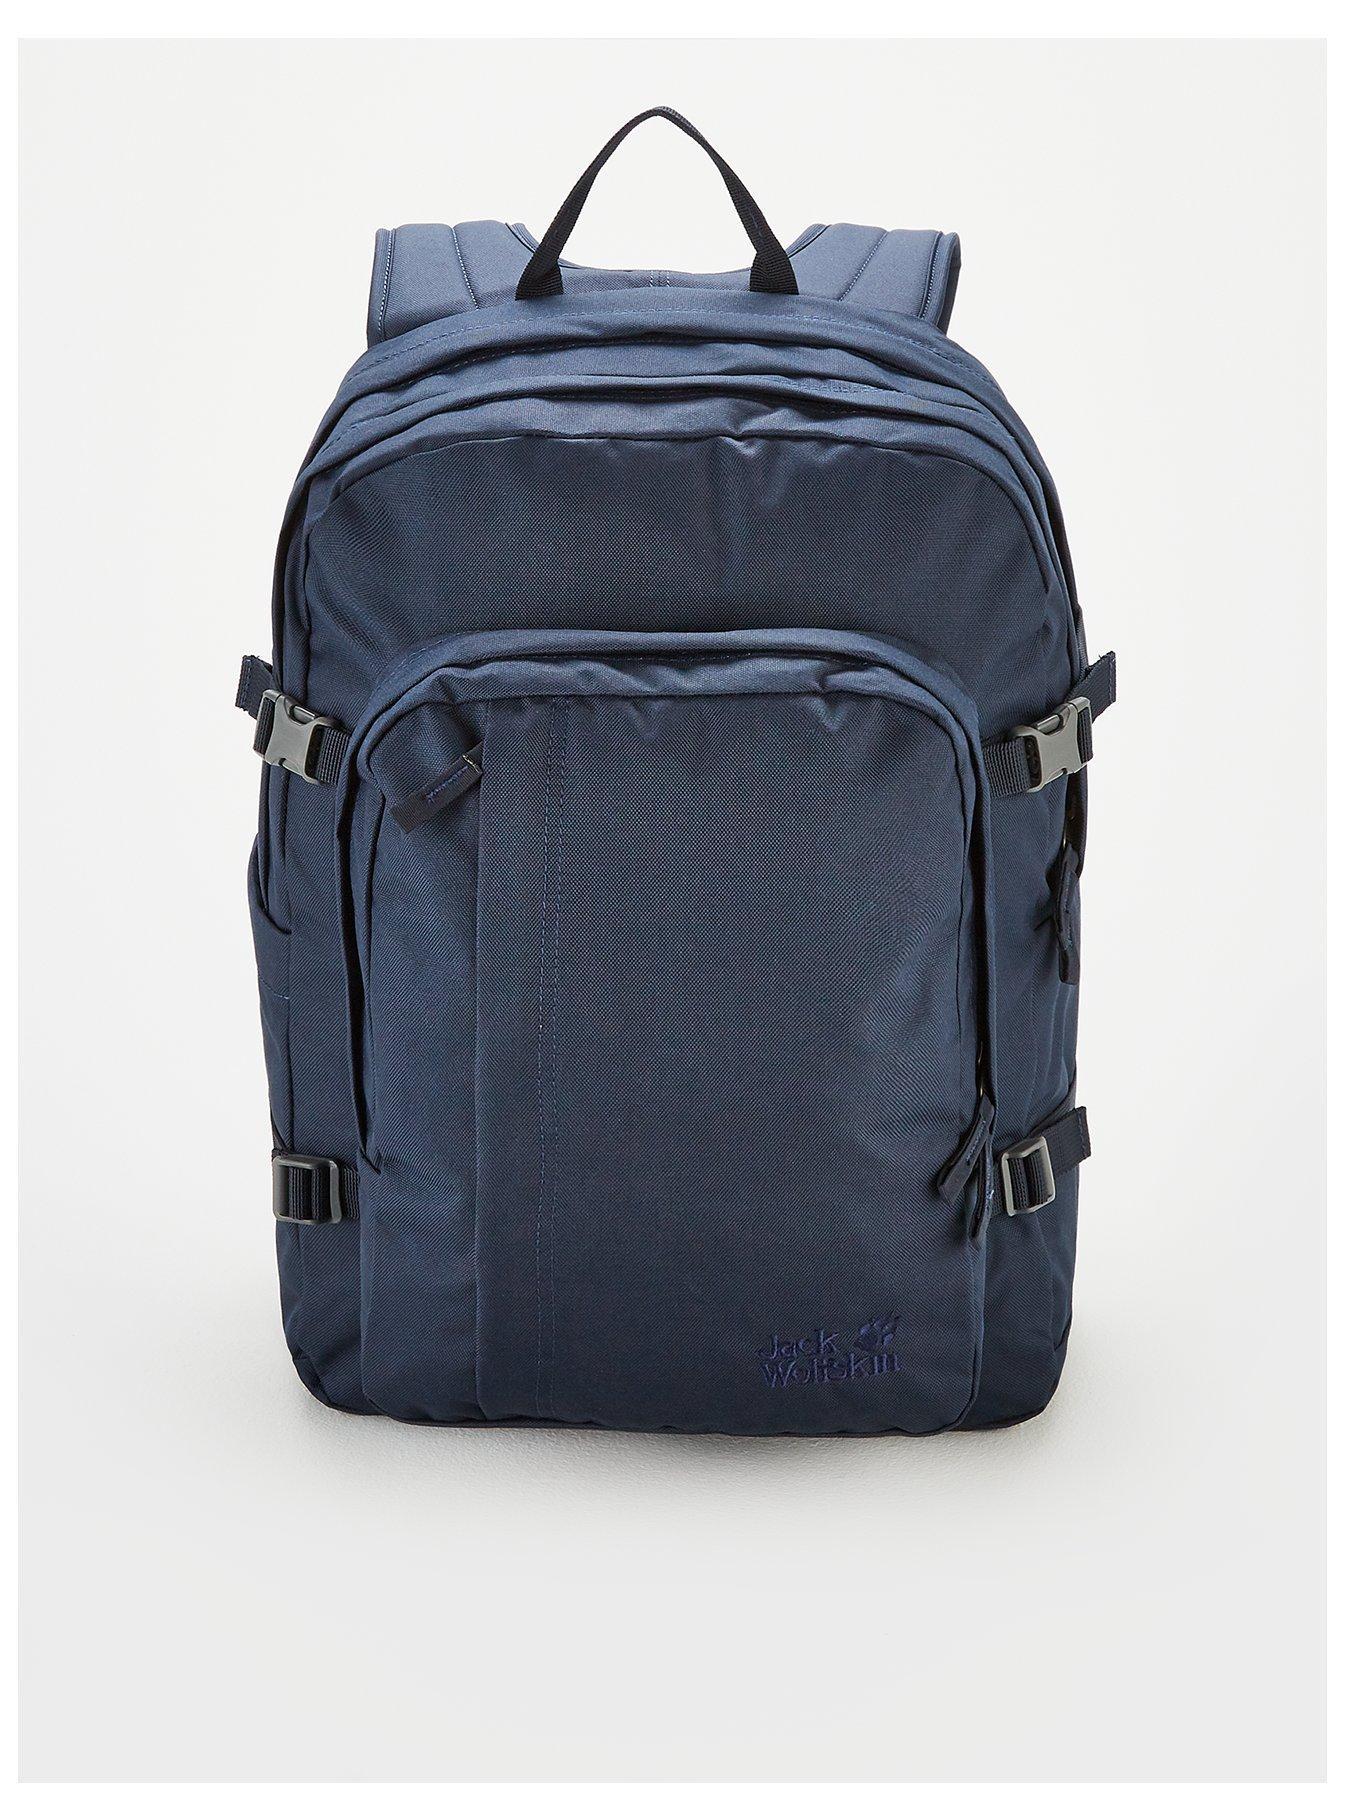 Bags & Rucksacks | Nike, Puma, Berghaus | Littlewoods